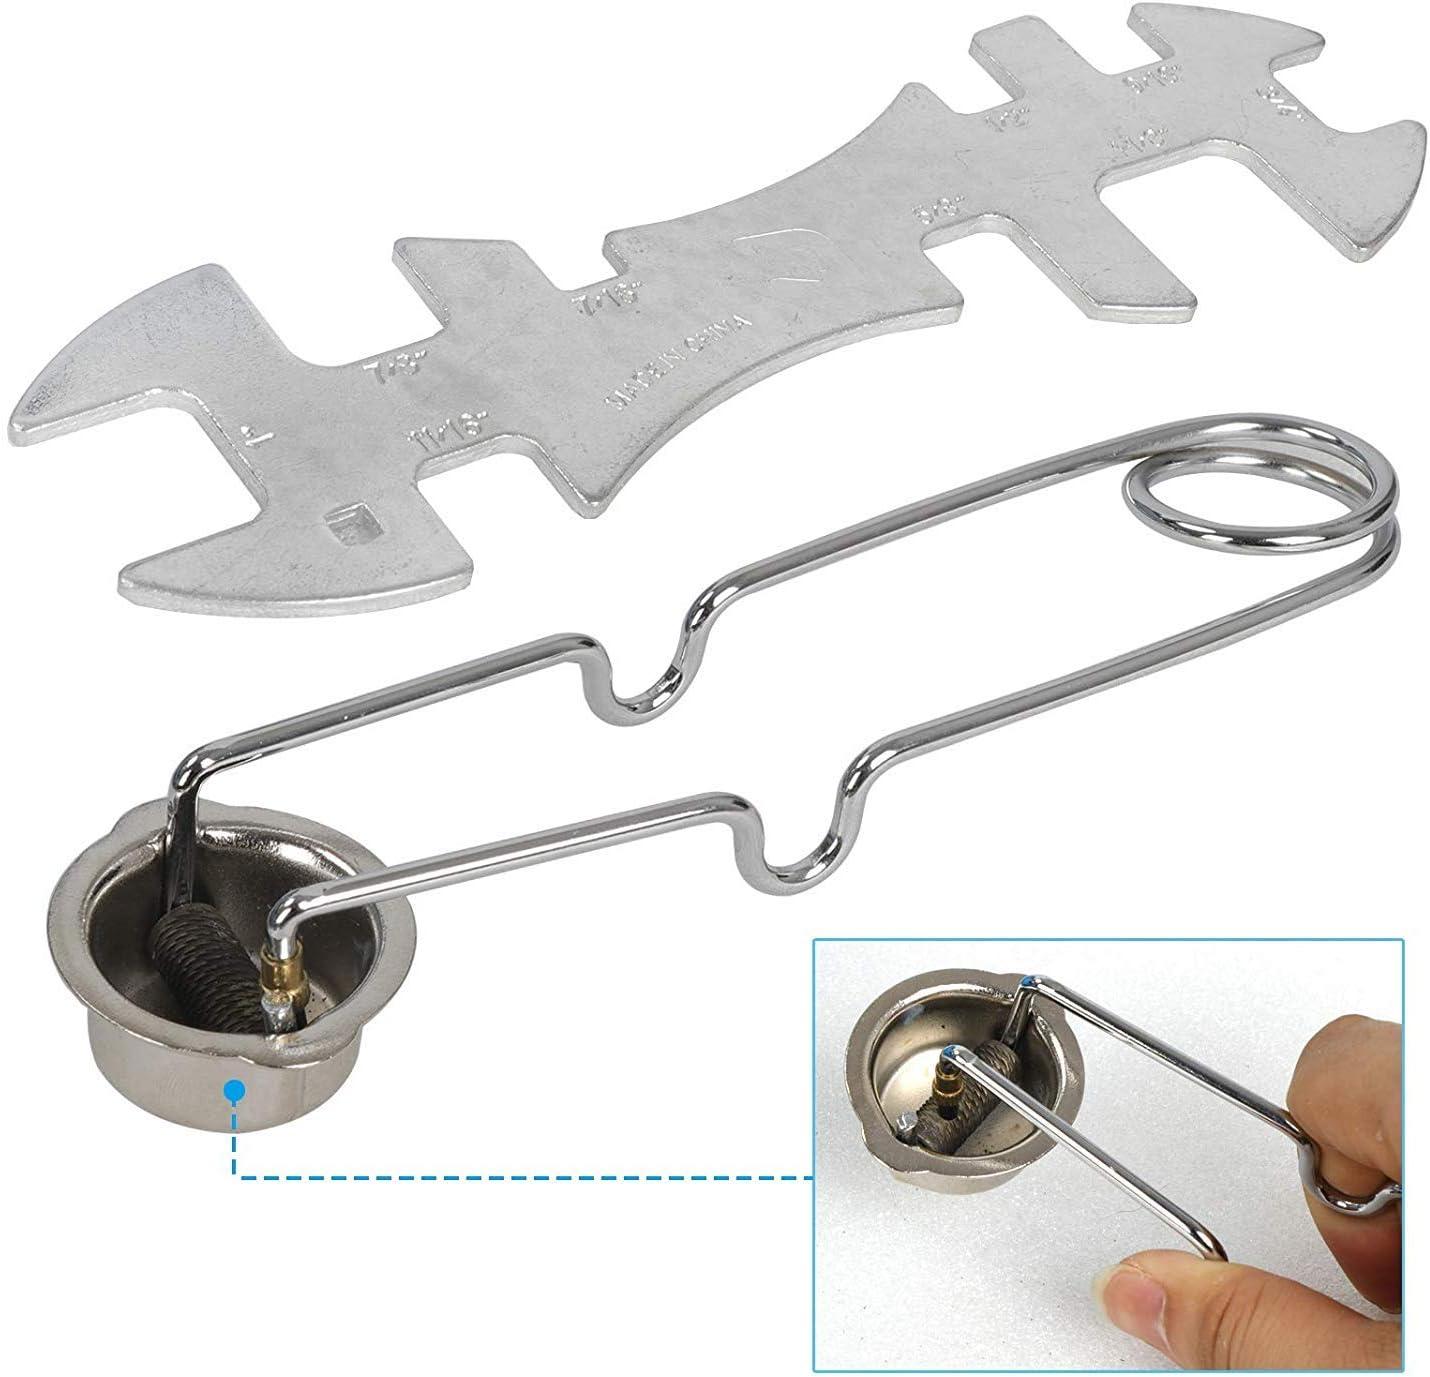 Acetylene Oxygen Weld Welding Cutting Torch Kit w//Gauges /& Goggles /& Hoses